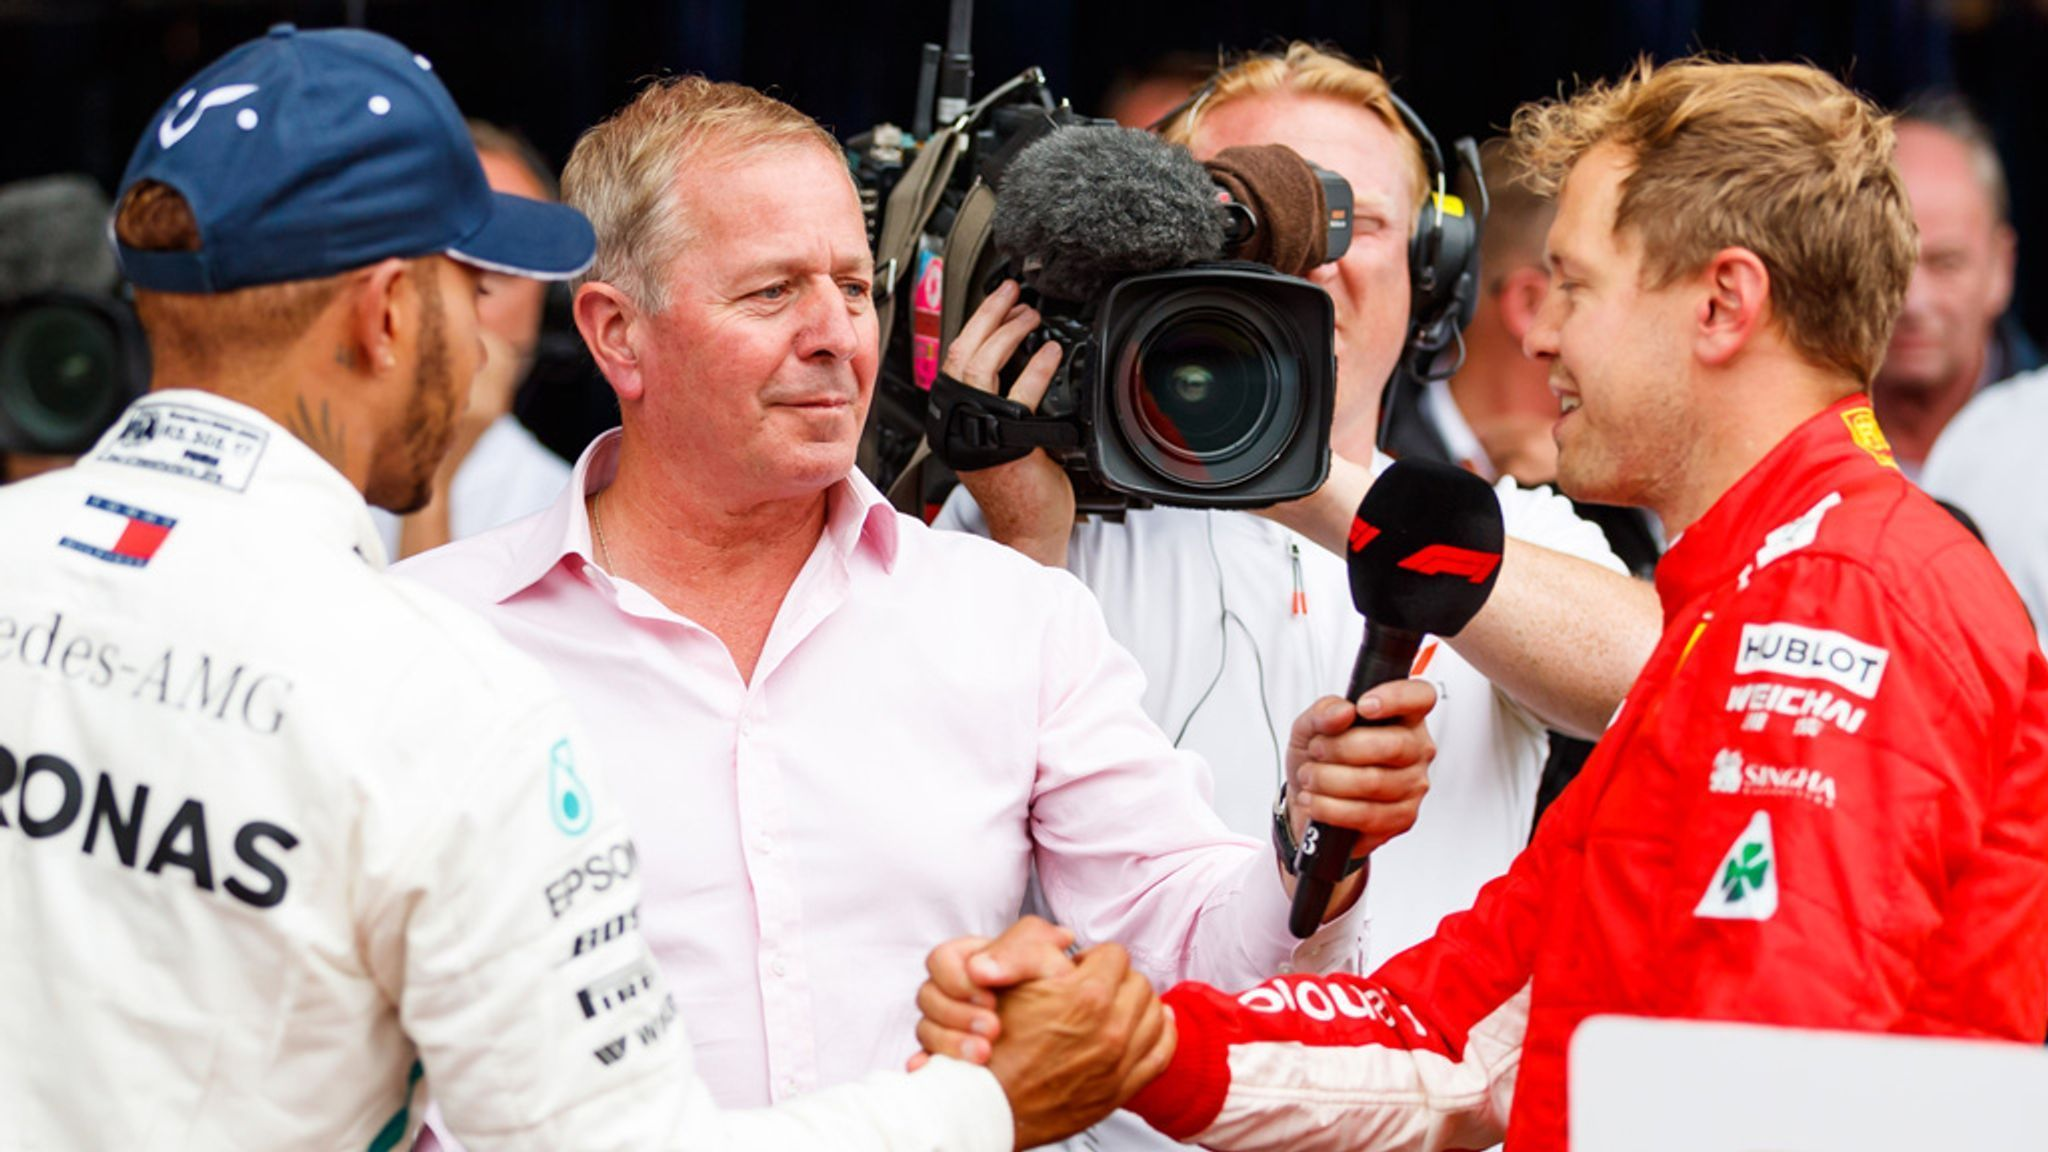 Martin Brundle, F1